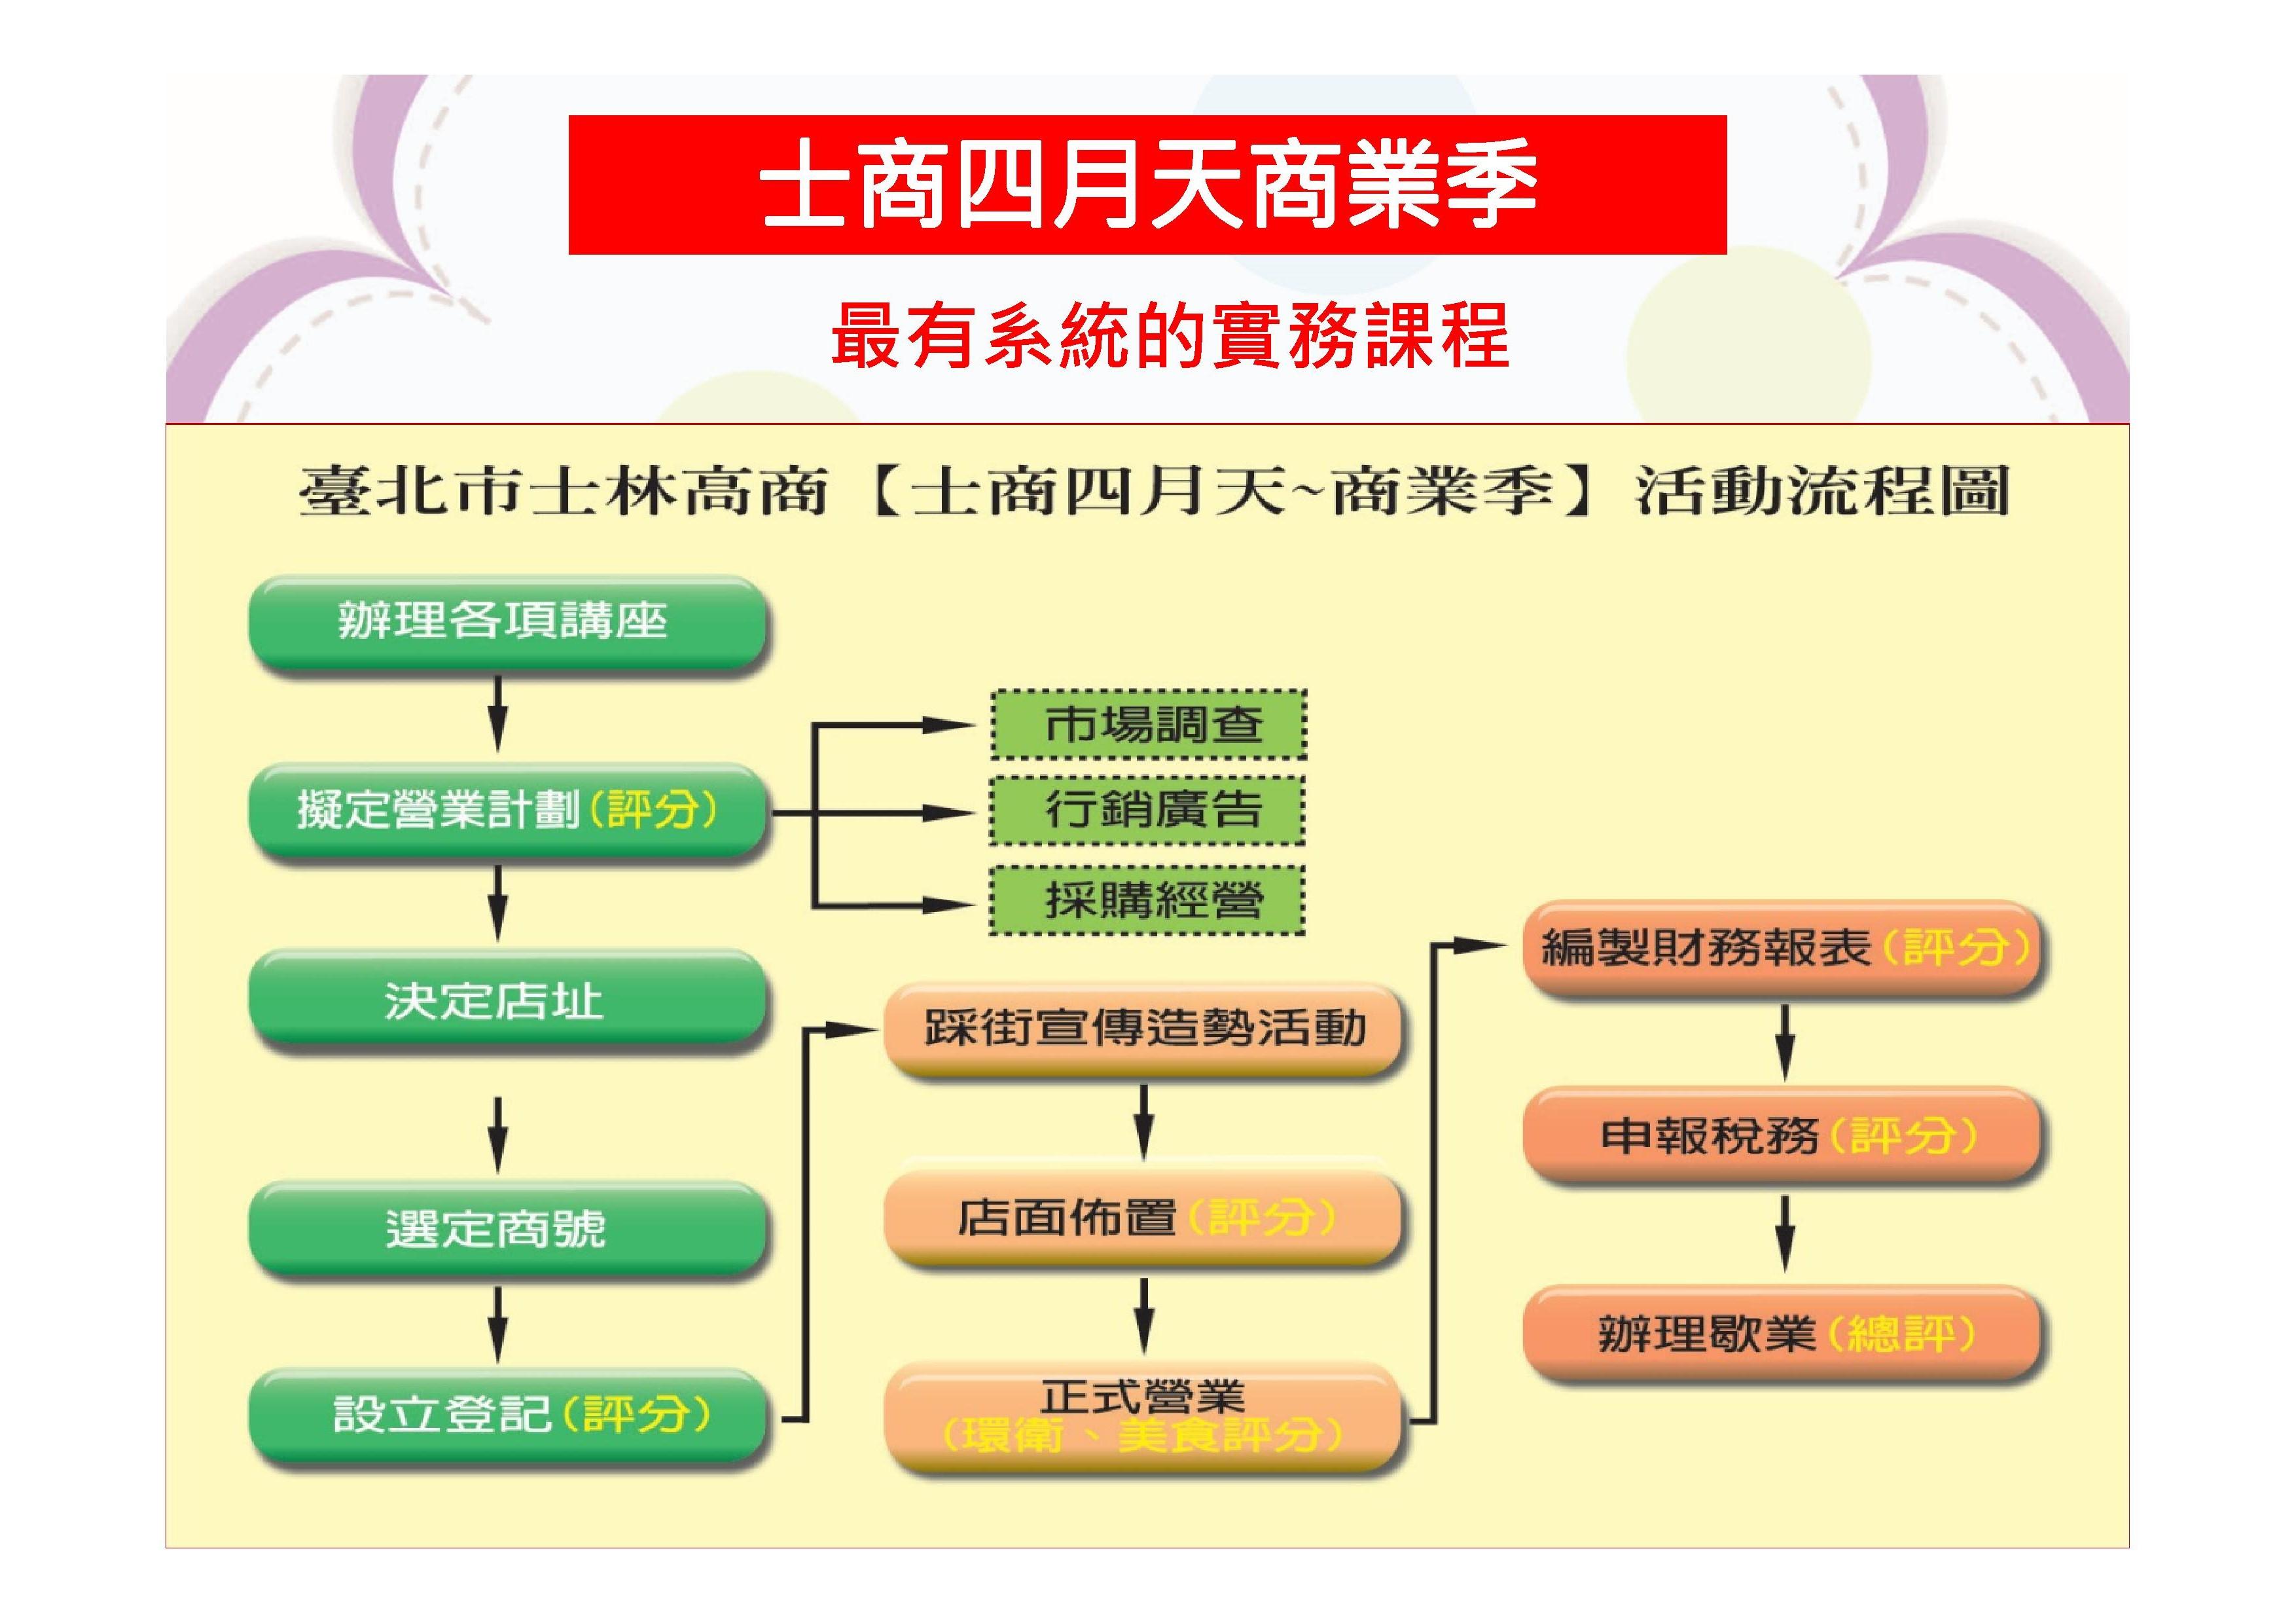 Microsoft PowerPoint - 技職教育暨士商簡介.pptx00031